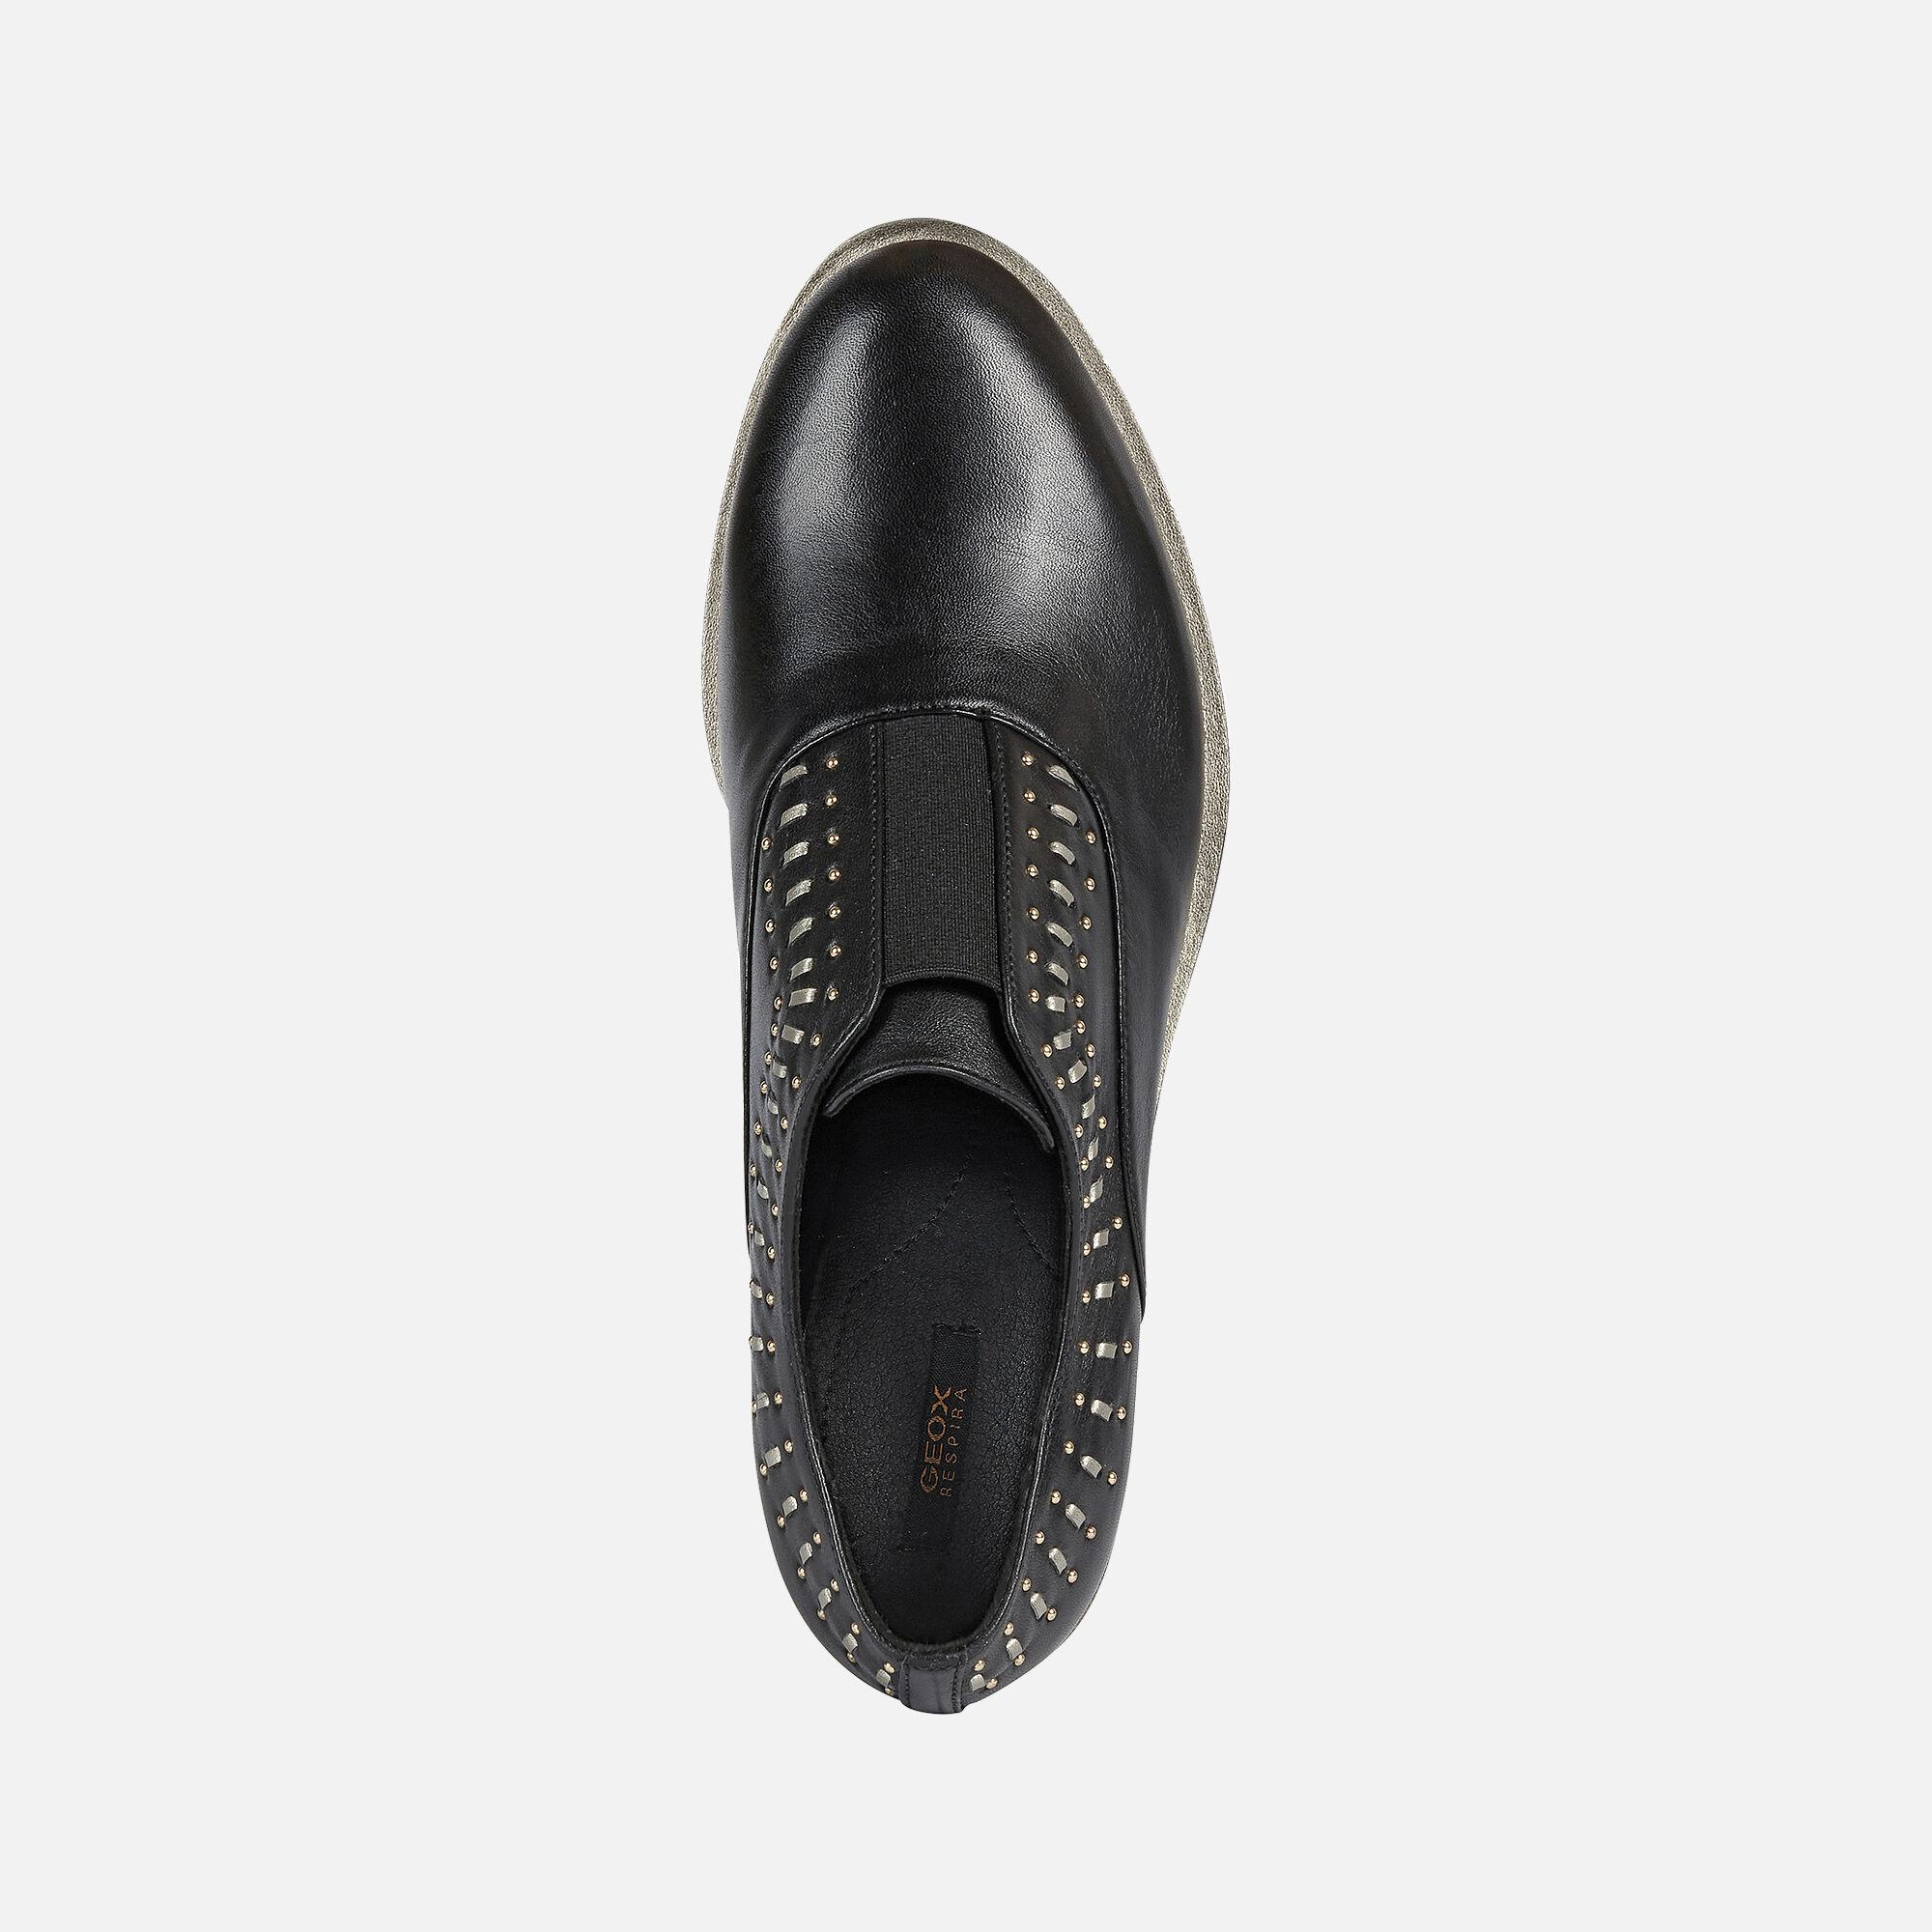 Geox BROGUE S Damen: Schwarze Schuhe   Geox® Online